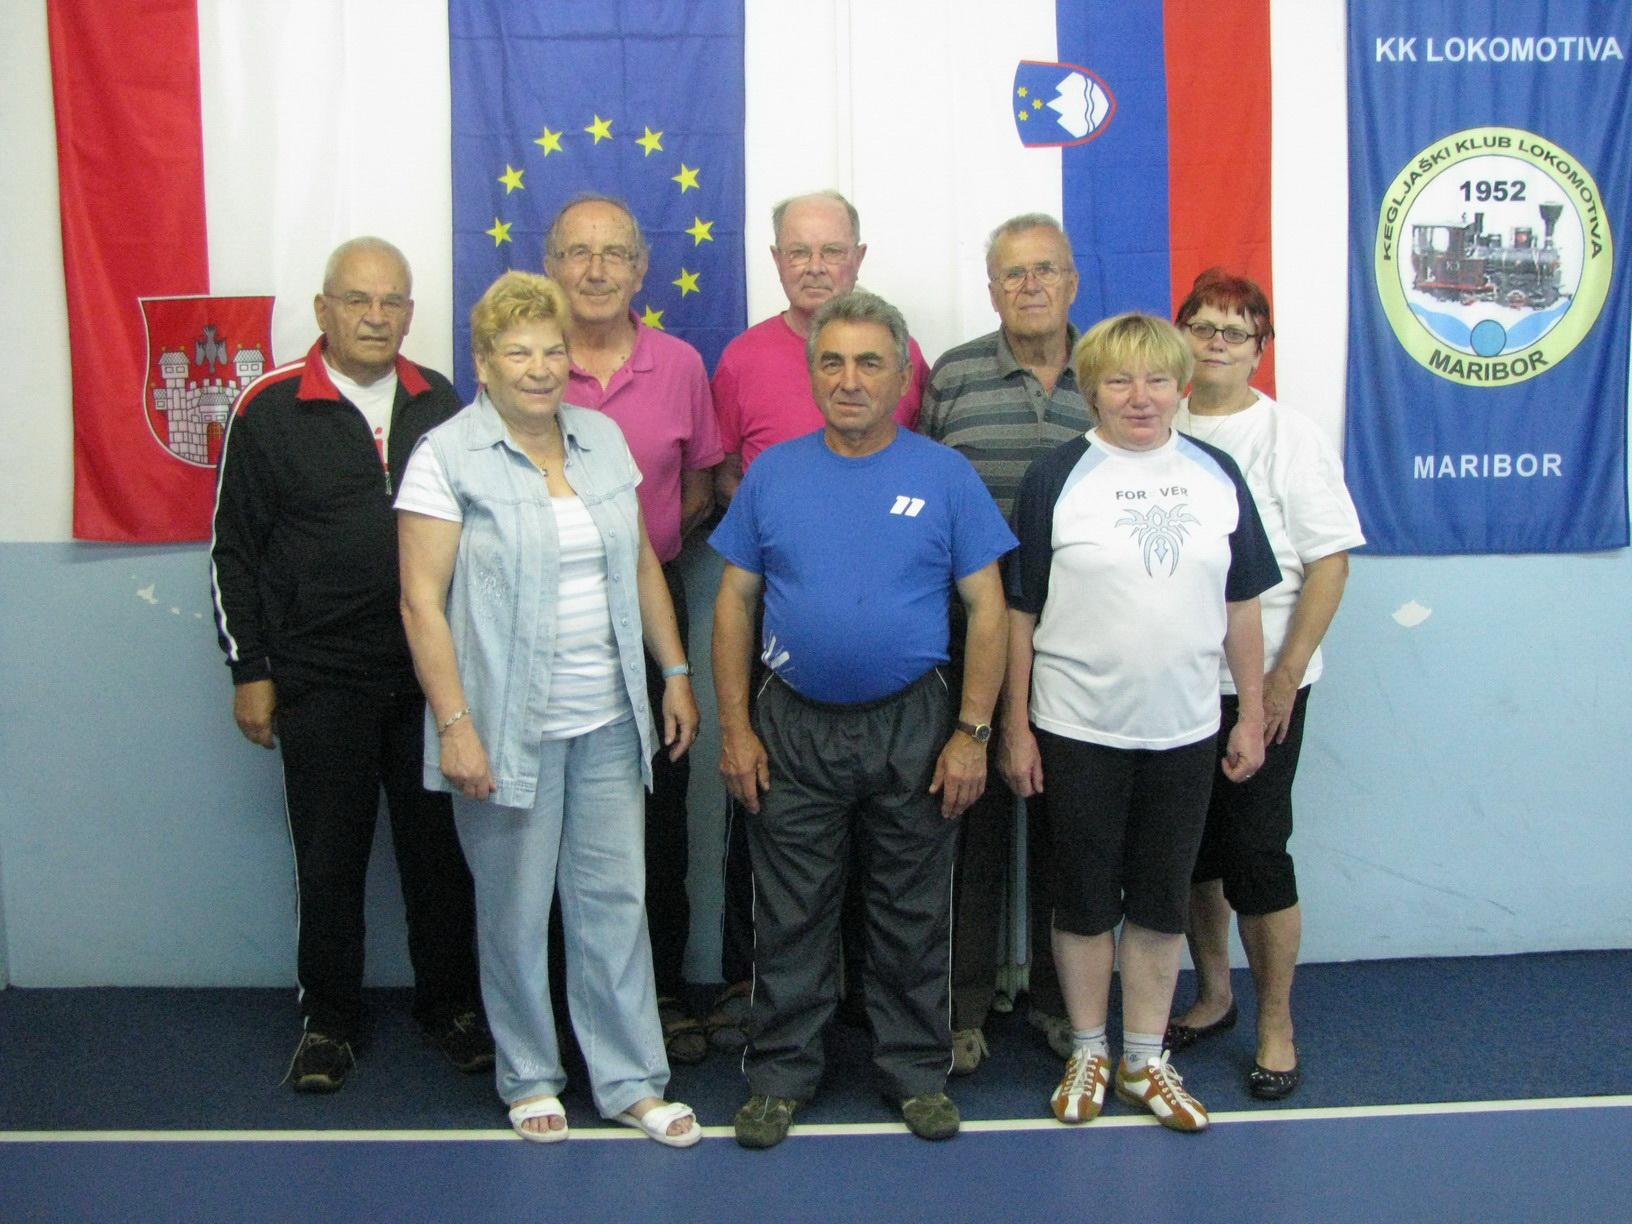 KK Lokomotiva veterani, 2012